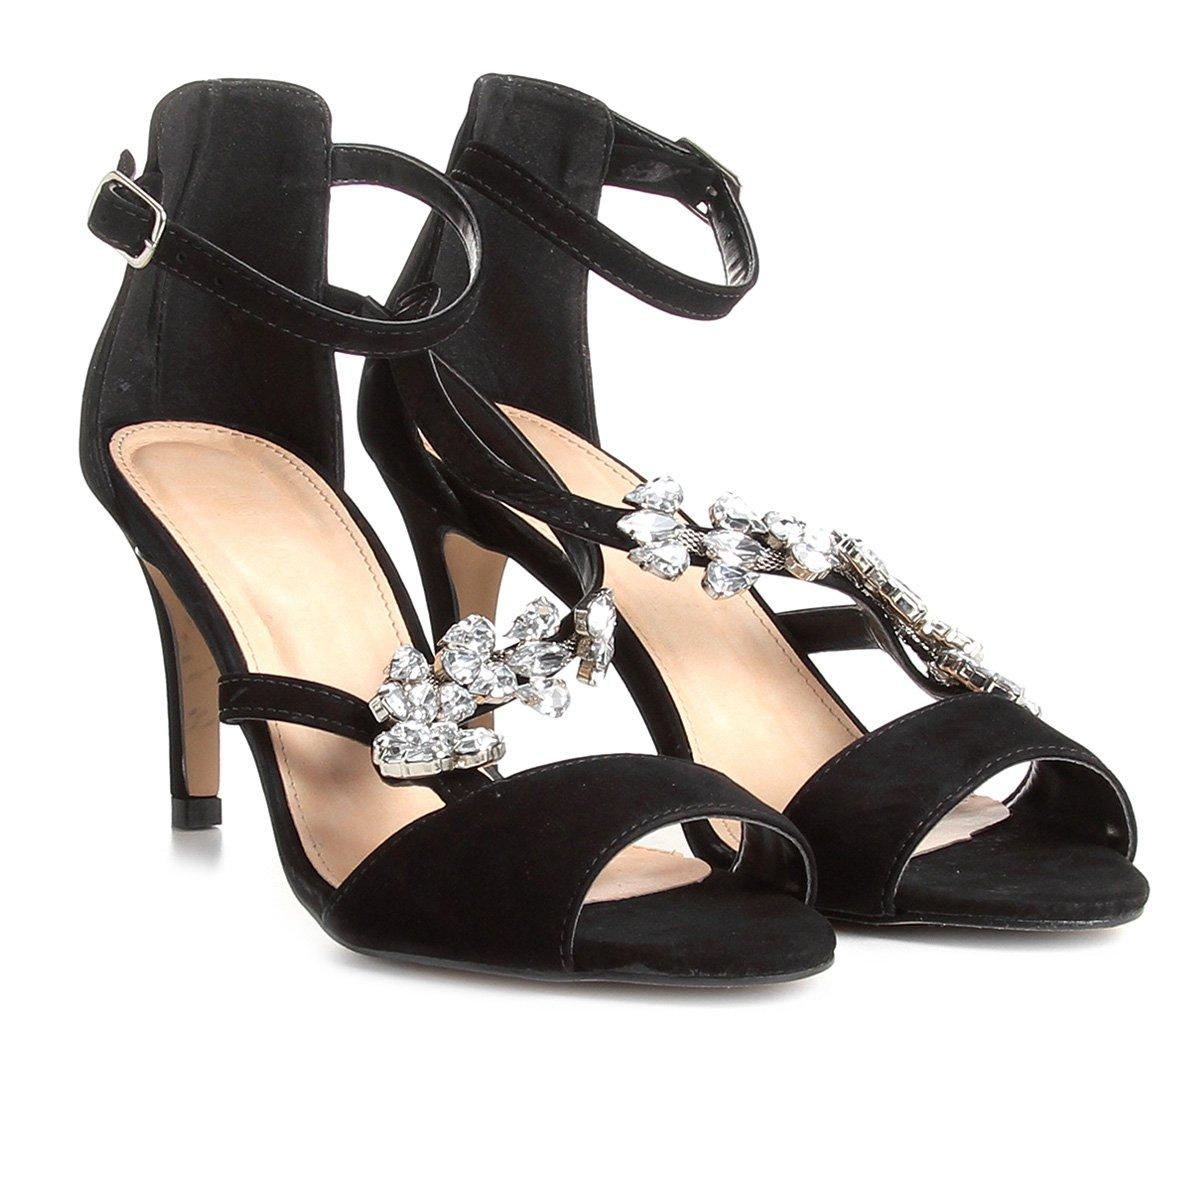 e6acb750d Sandália Couro Shoestock Salto Fino Pedraria Feminina - Preto - Compre  Agora